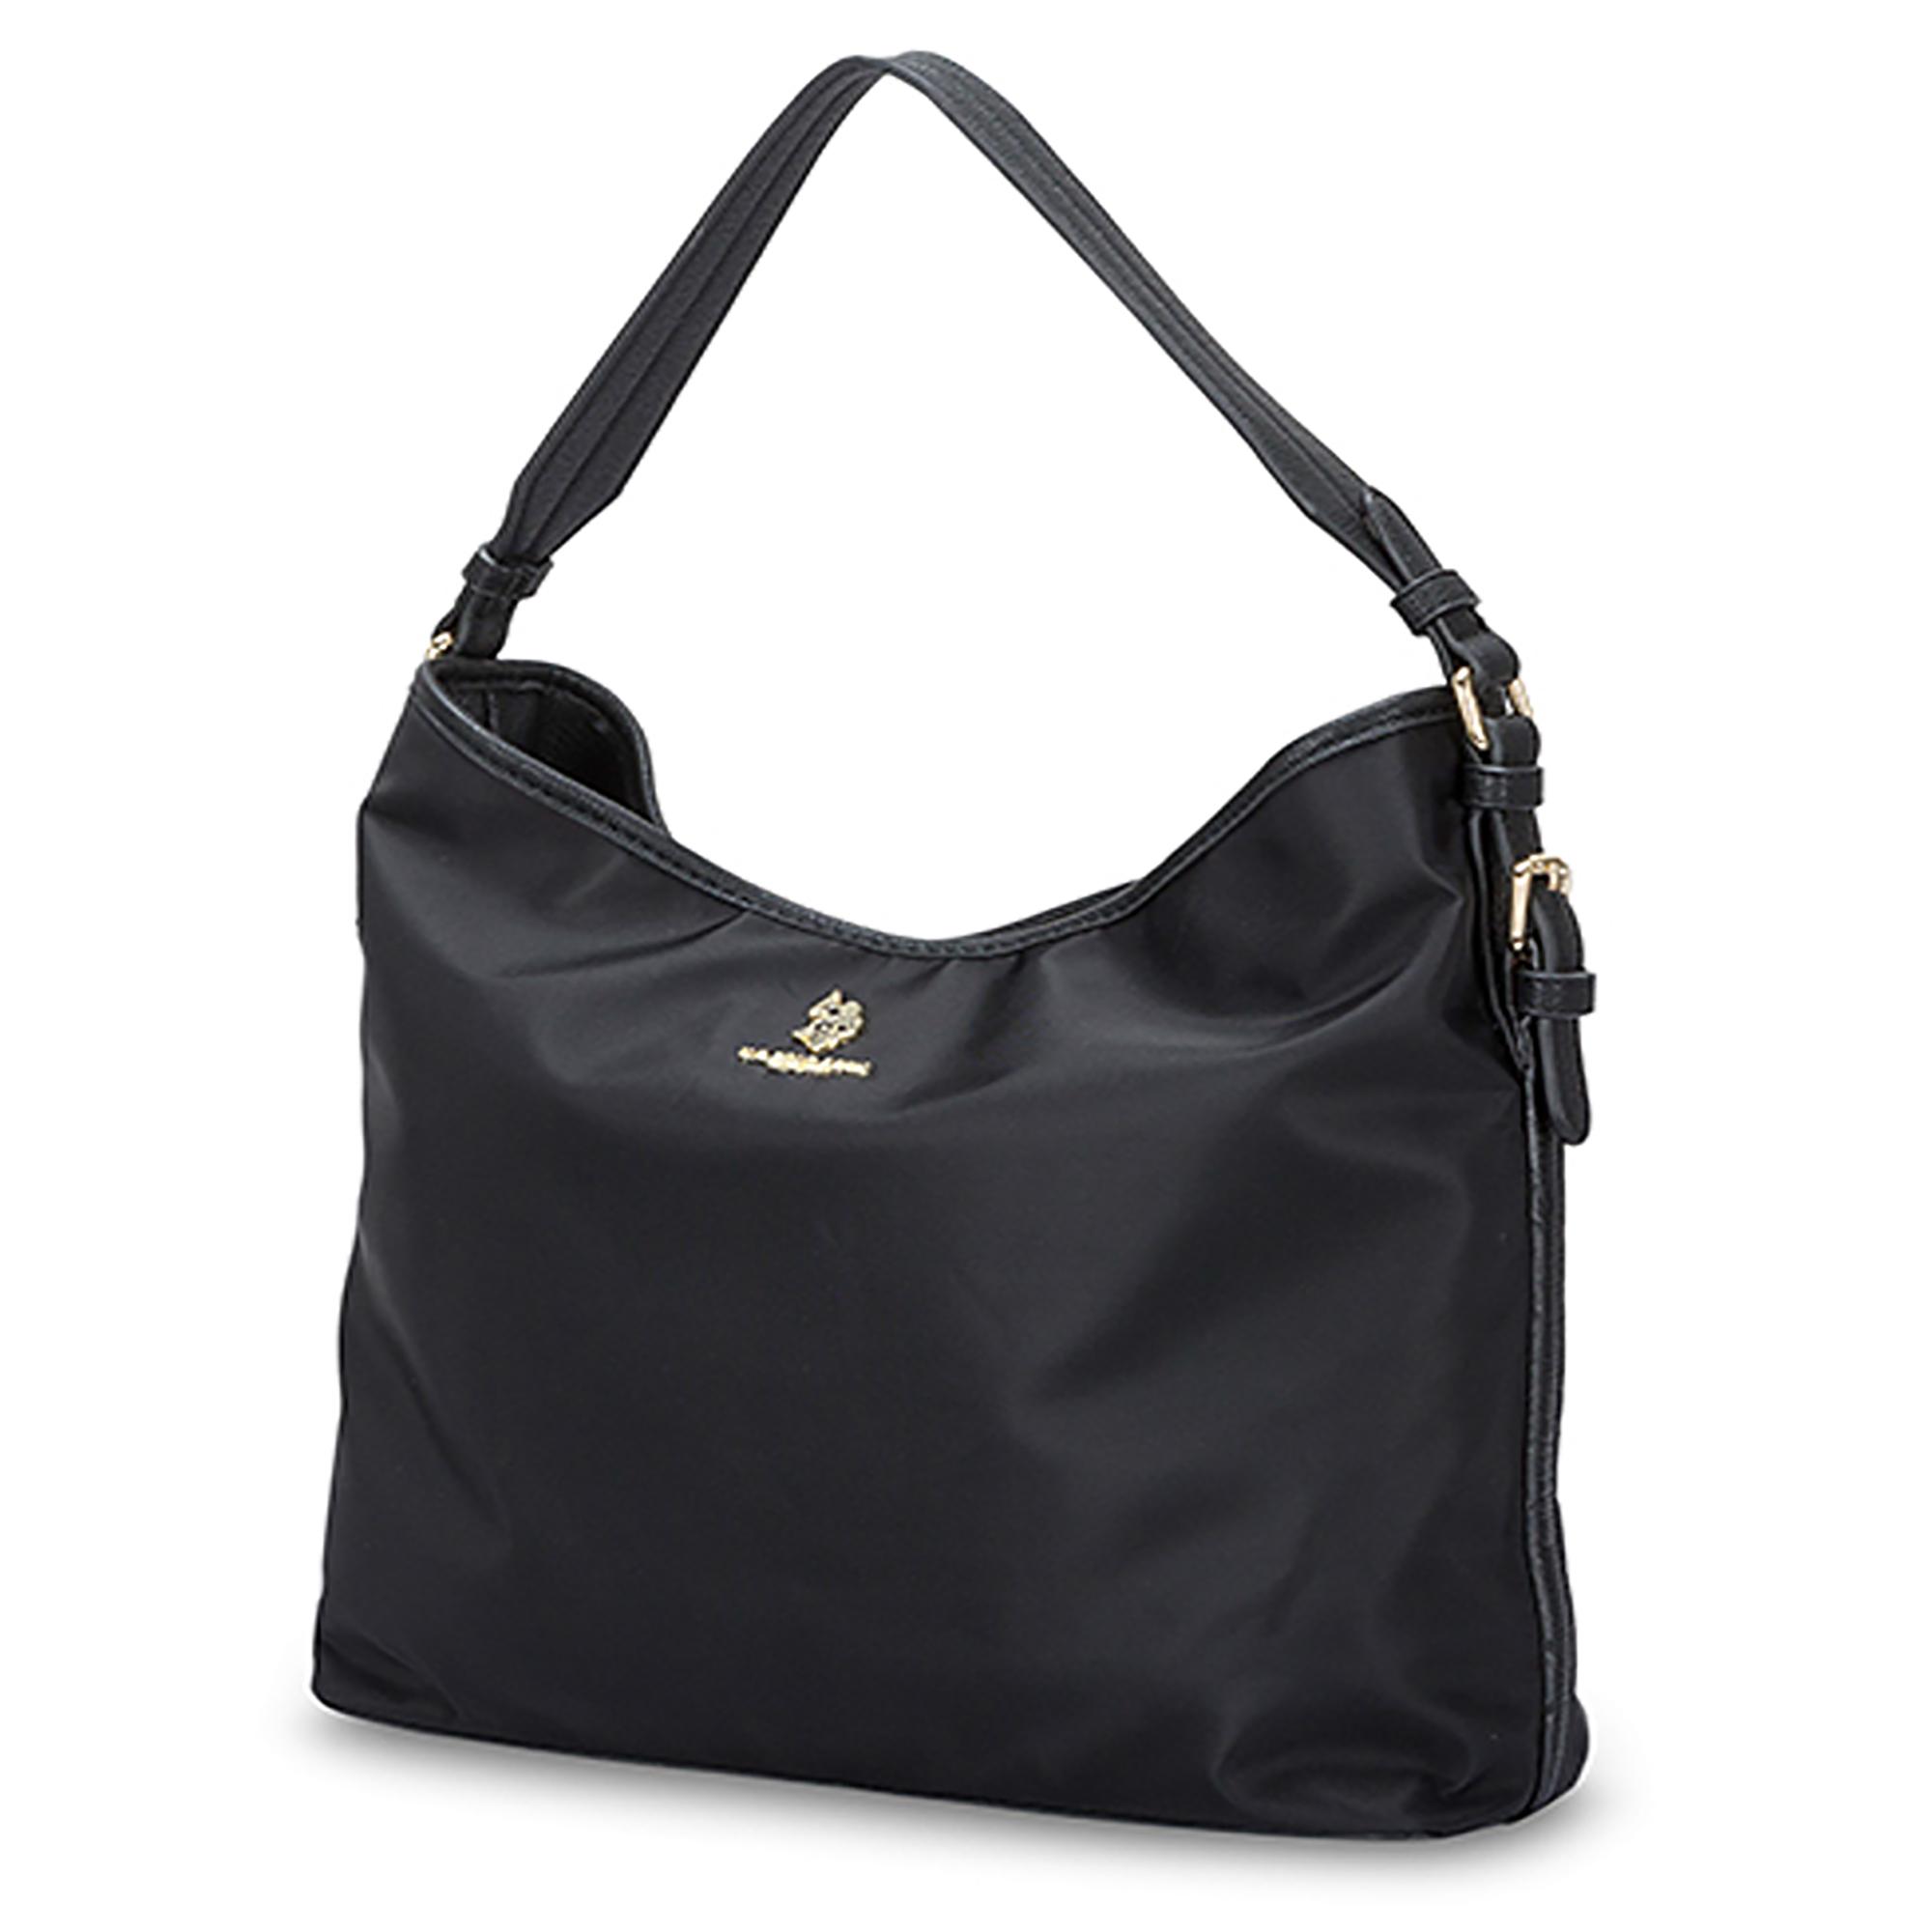 NEW-US-Polo-Assn-Houston-Hobo-Zip-Top-Handbag-Casual-Fashion-Nylon-Single-Strap thumbnail 5